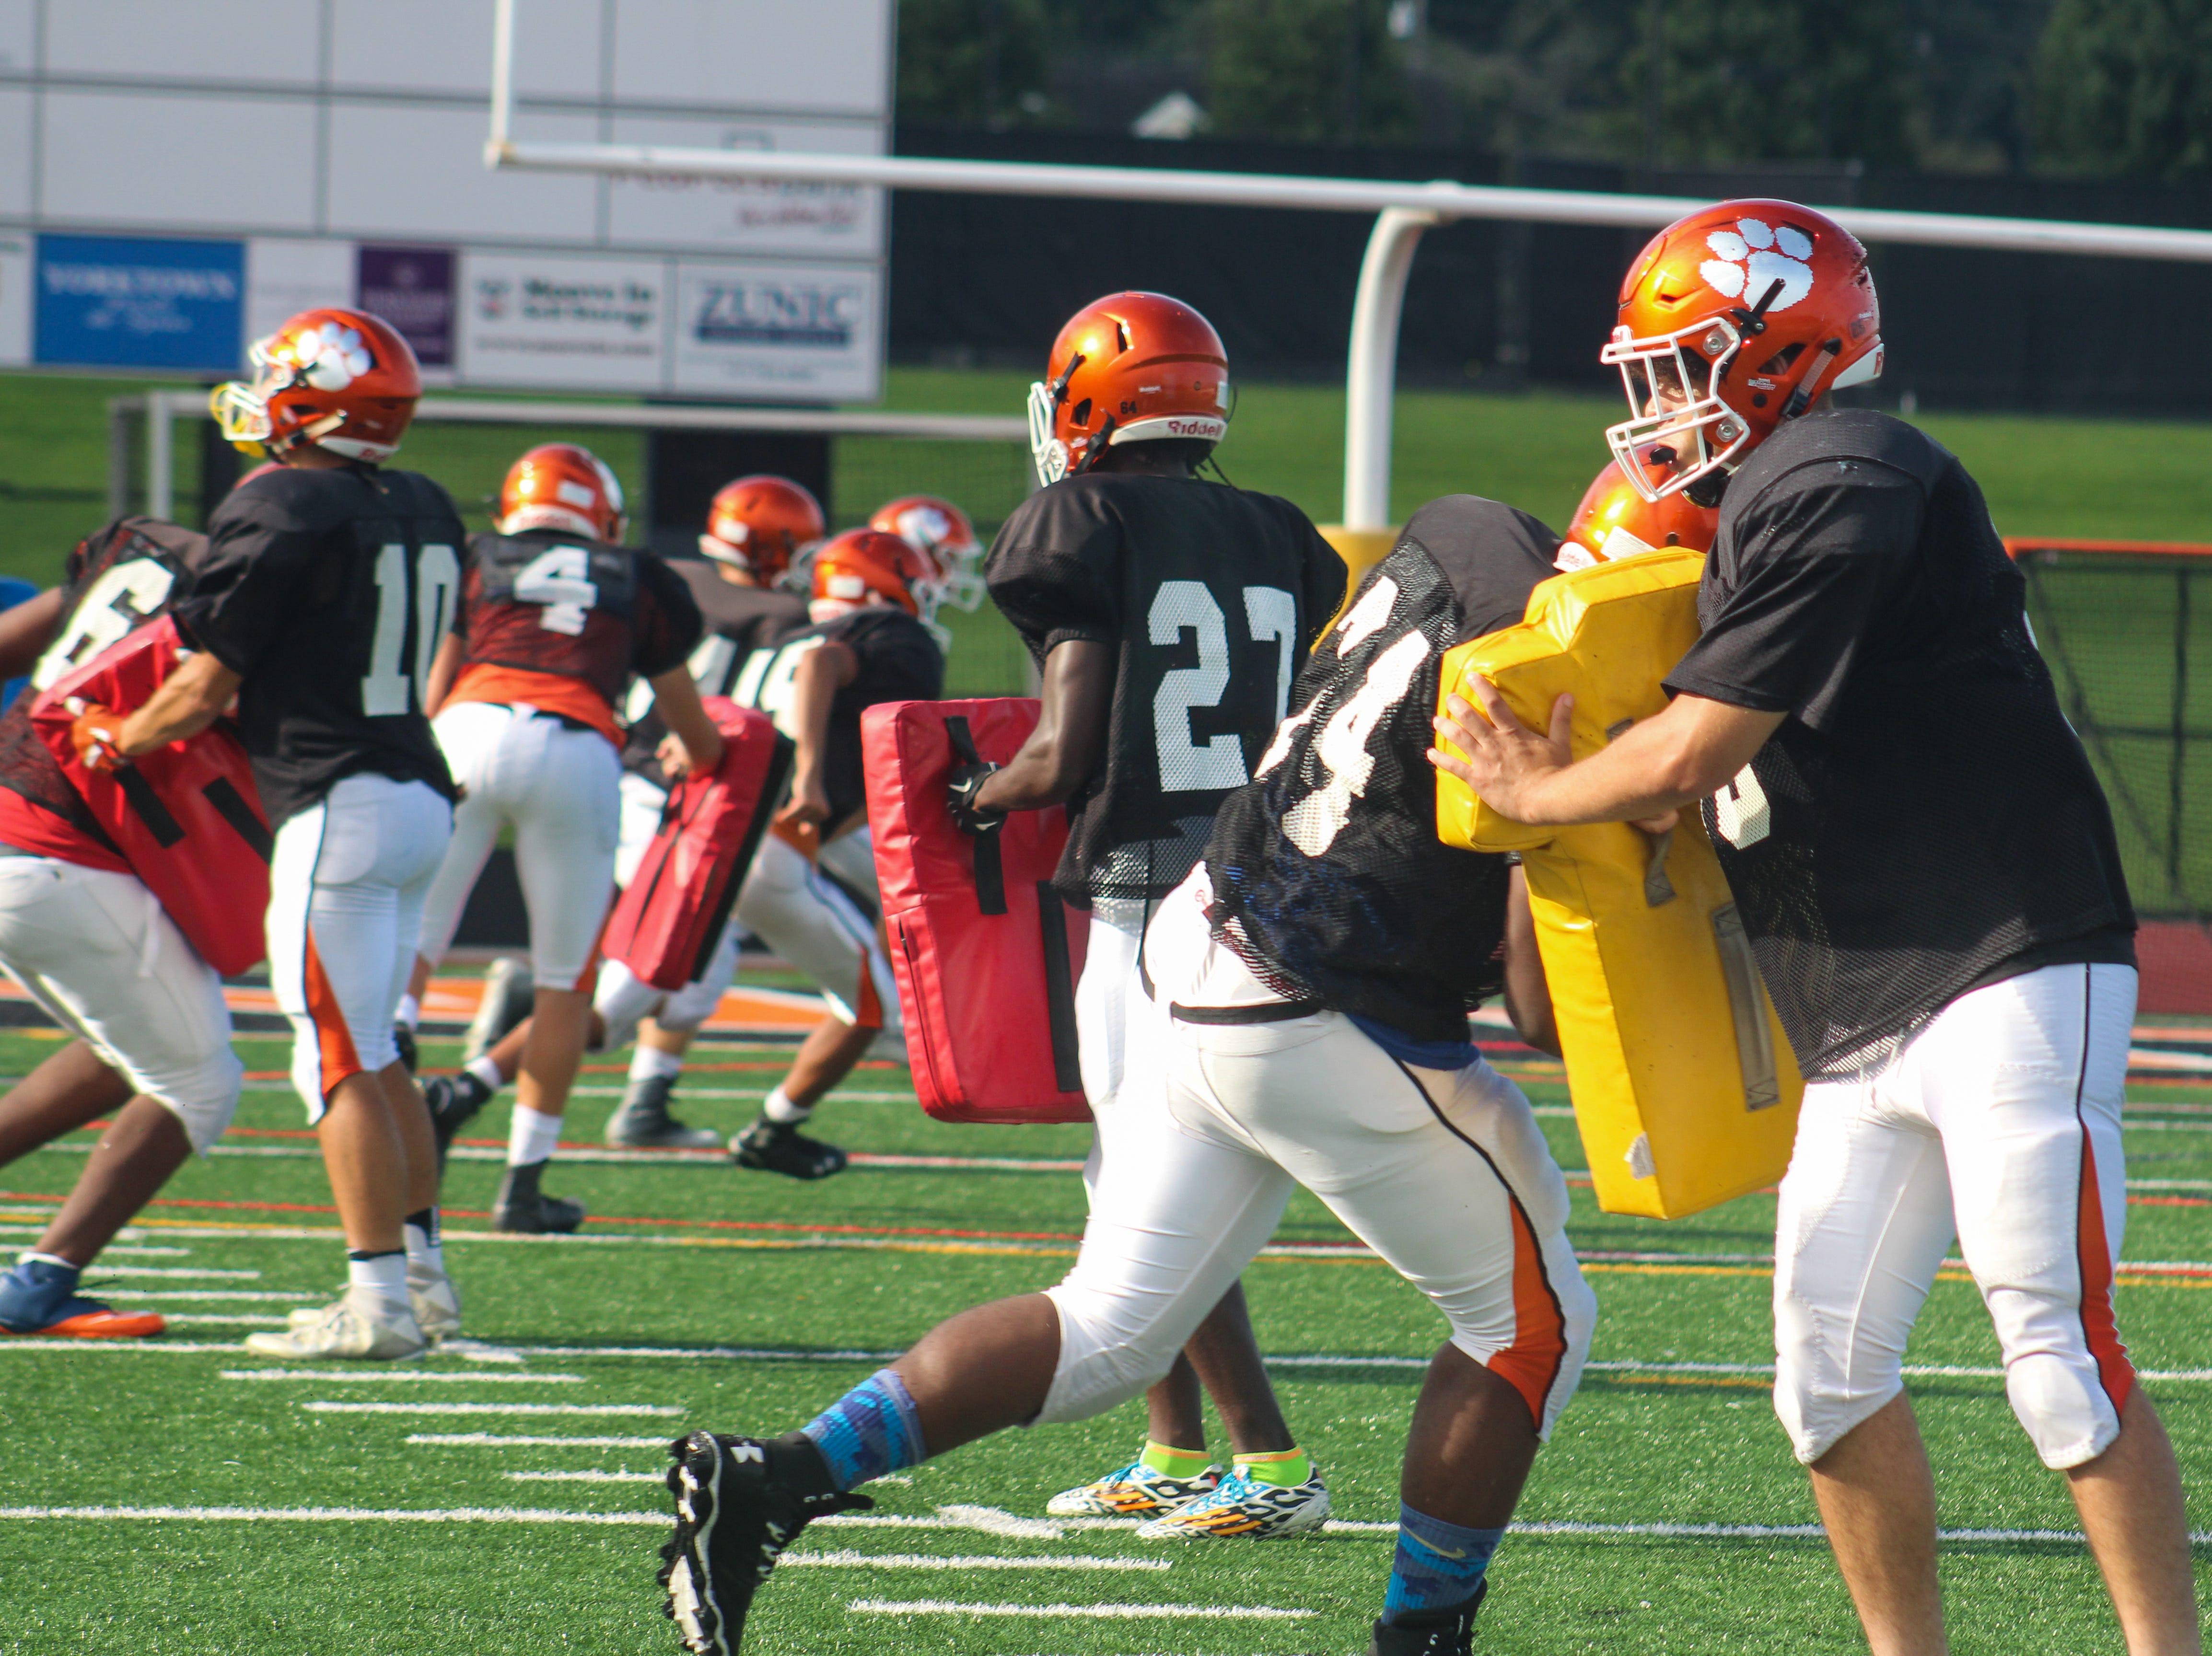 Central York High School football players run through a drill on August 13, 2018.